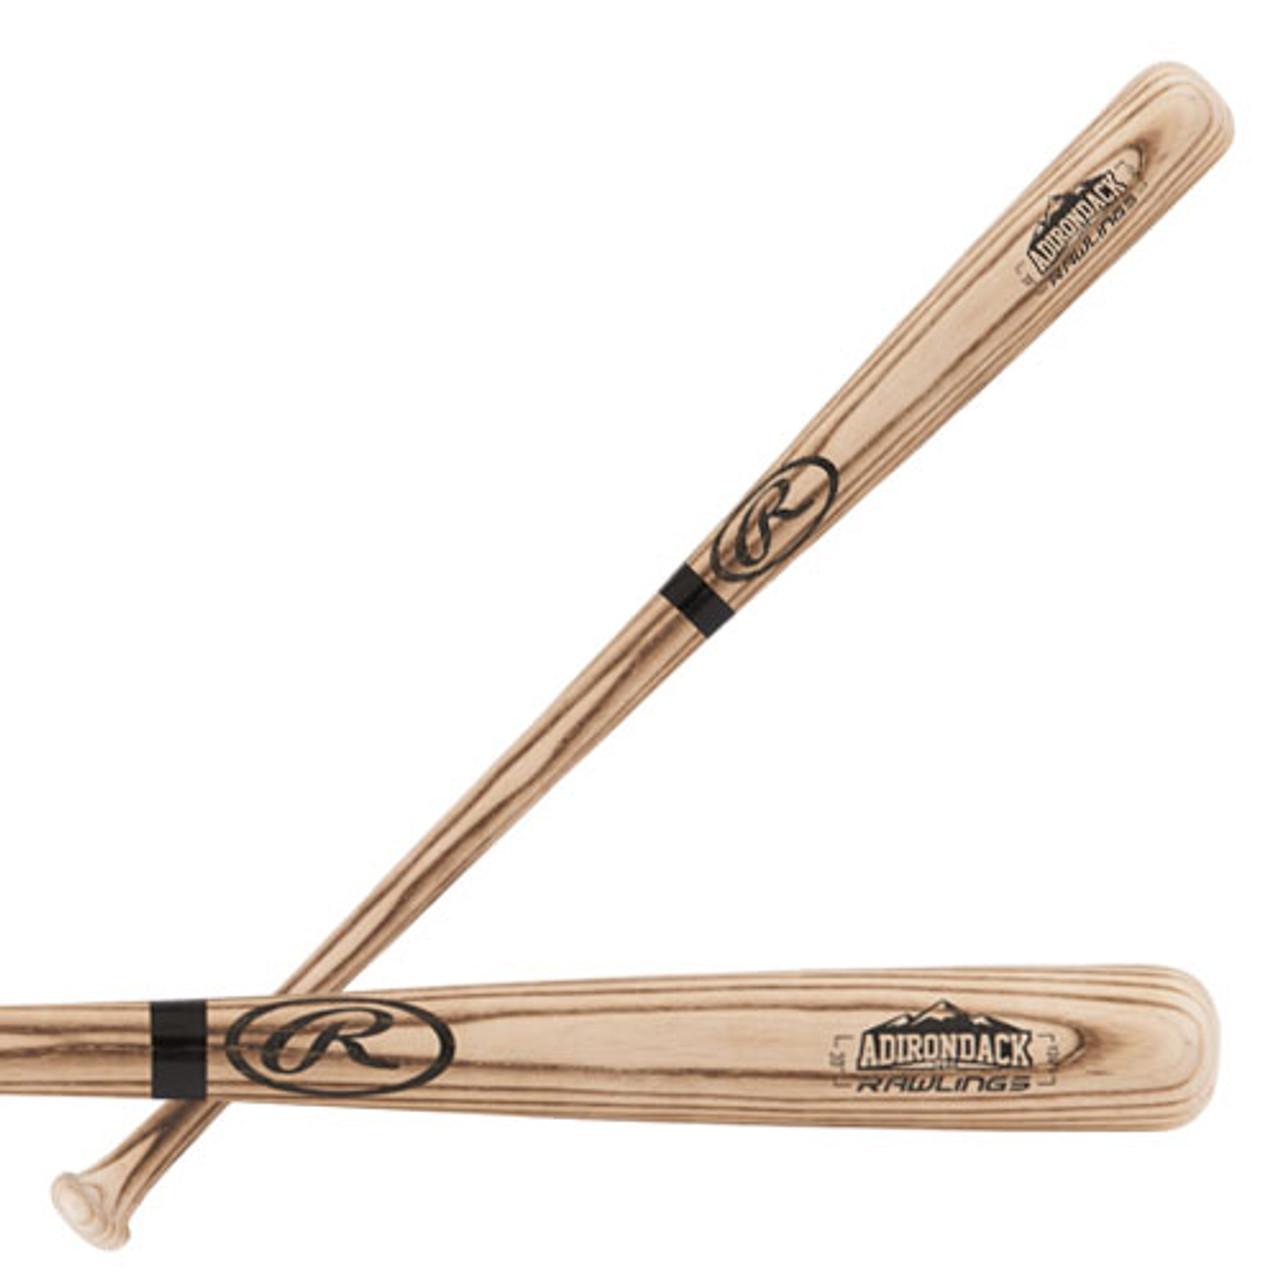 Rawlings Adirondack Ash Wood Youth Baseball Bat